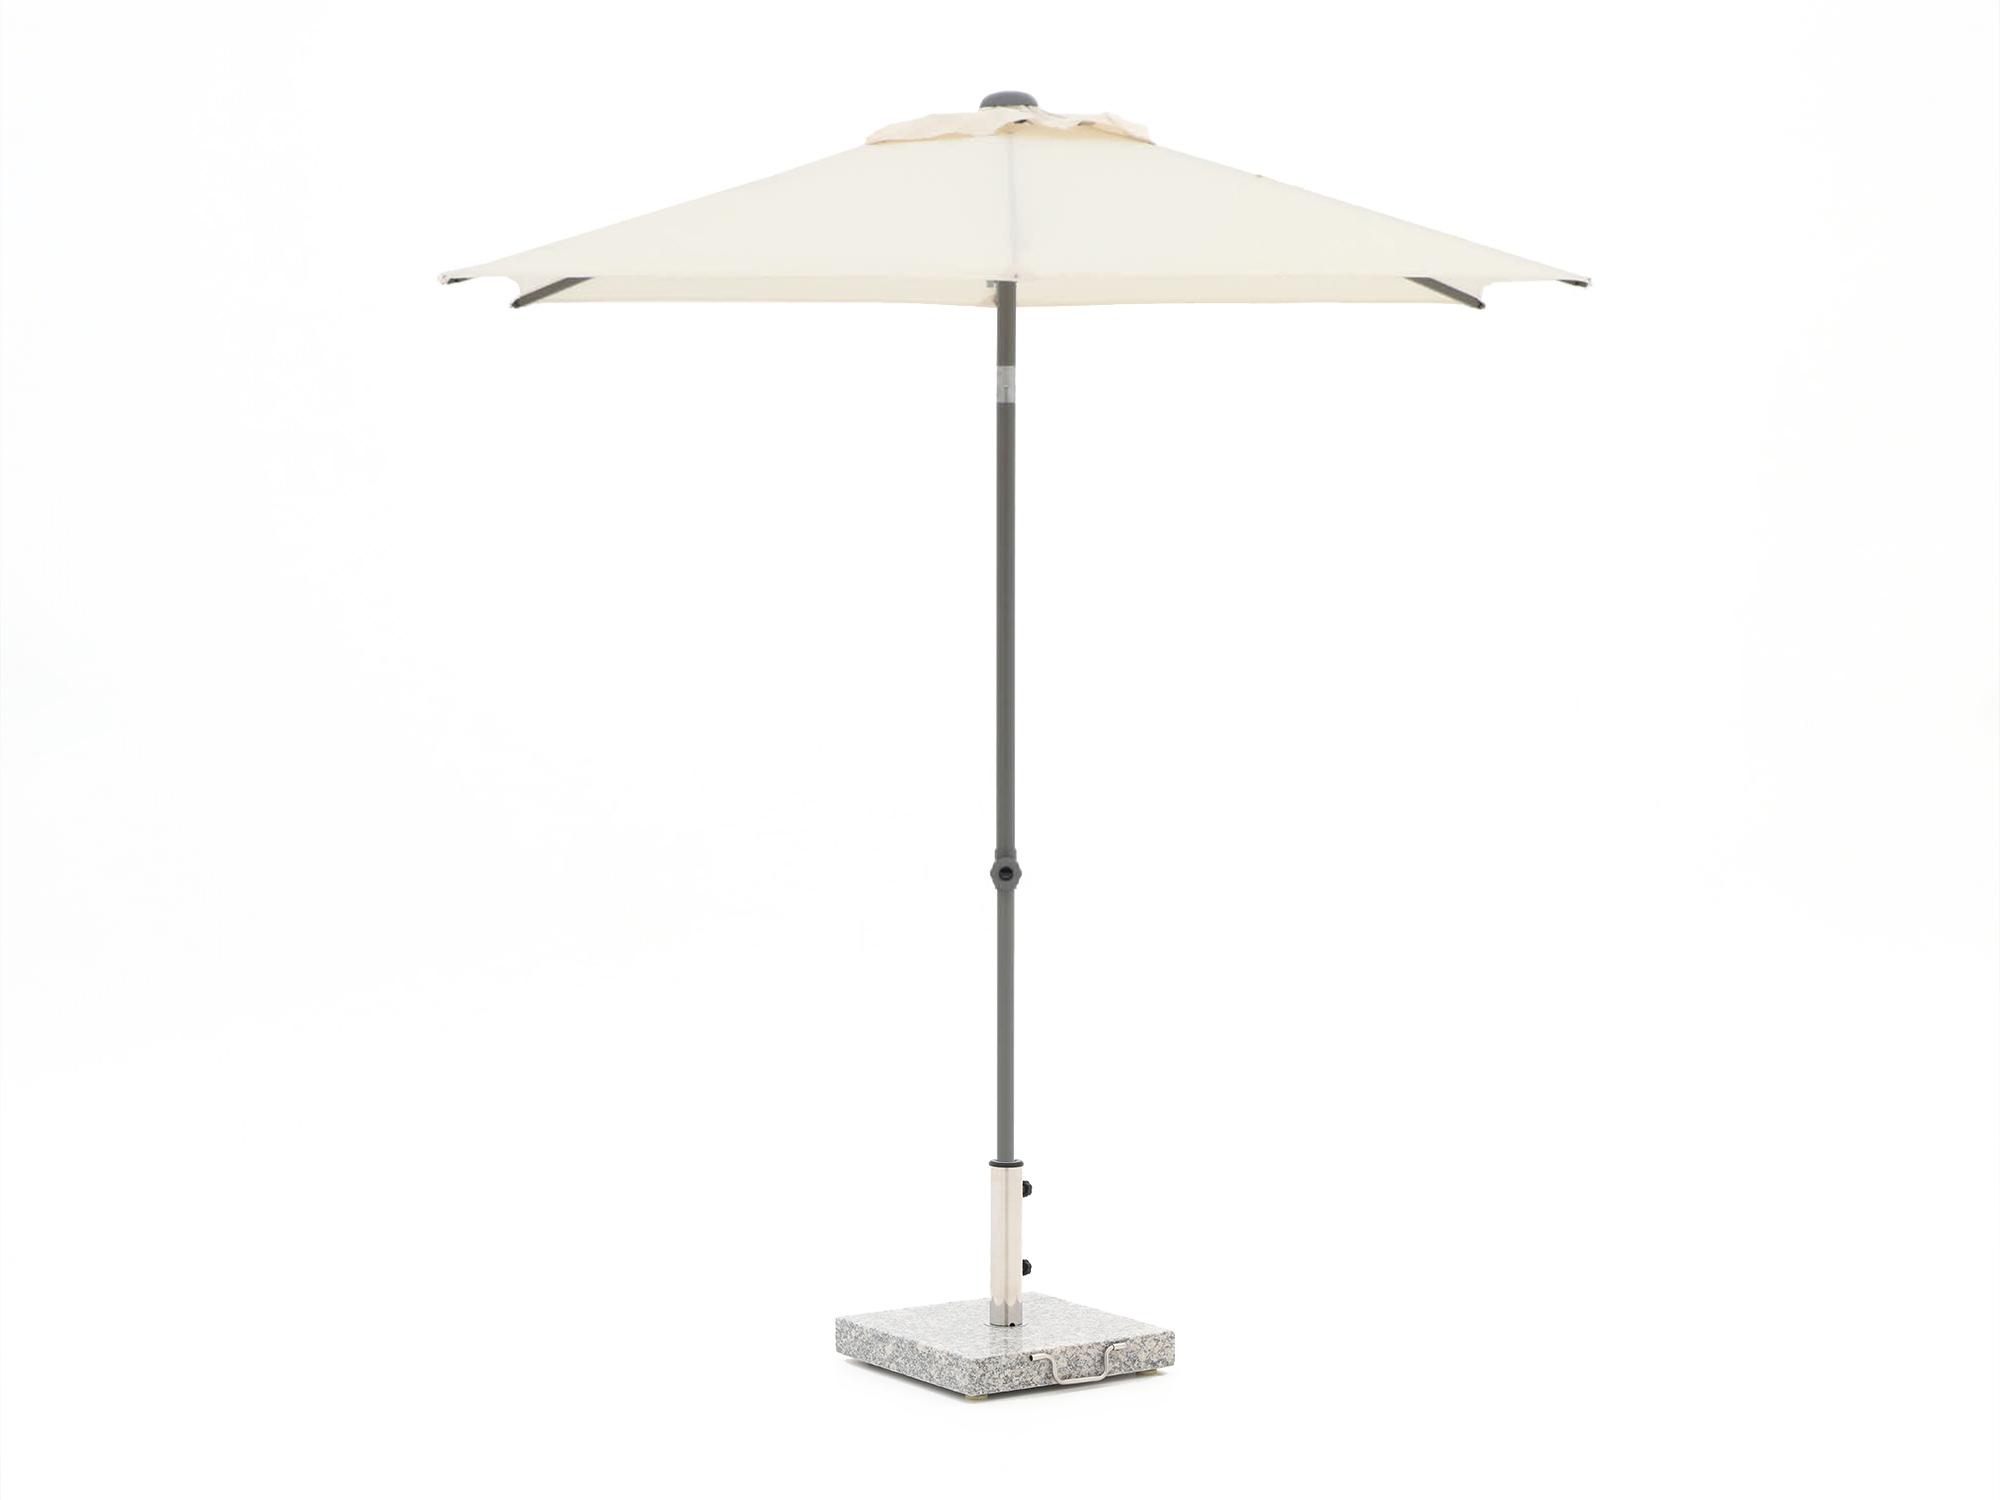 Shadowline Push-up parasol 210x150cm - Laagste prijsgarantie!